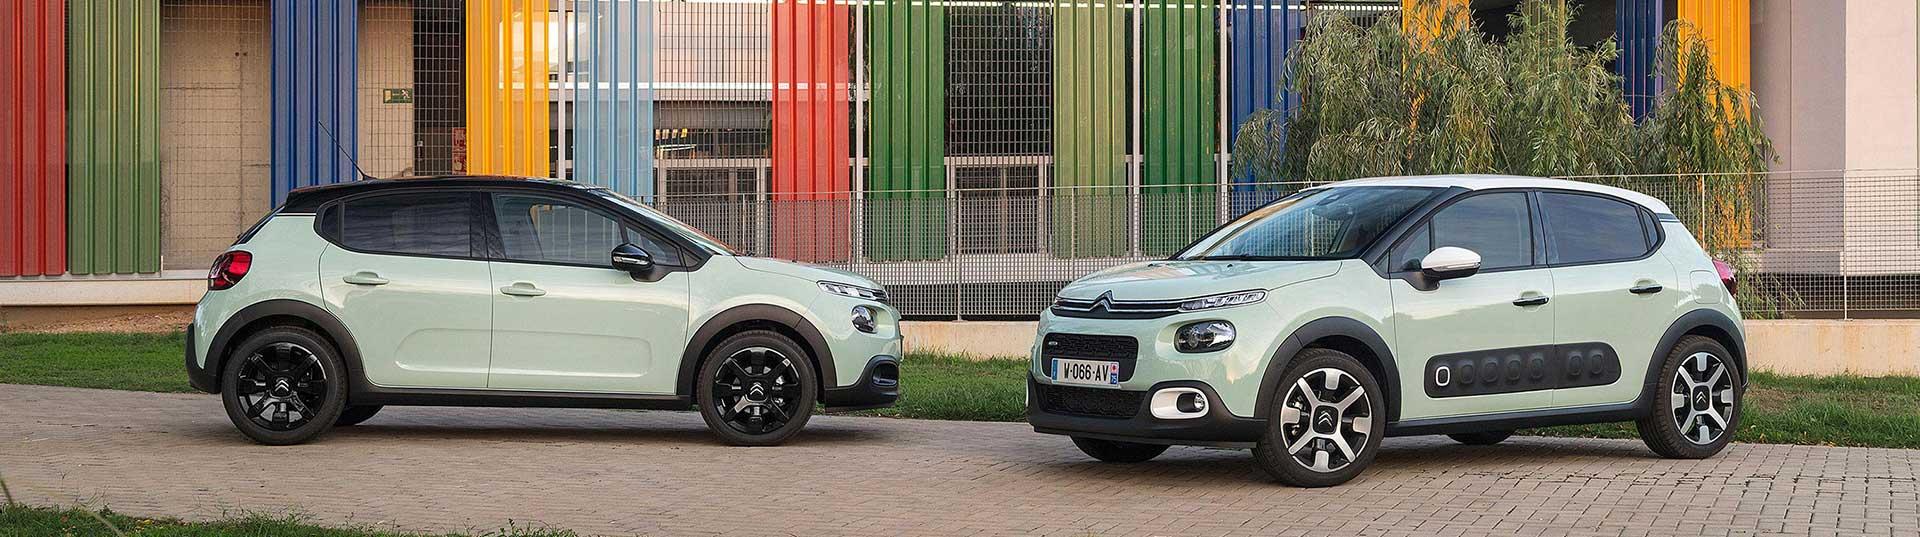 Citroën C3 Portas Abertas